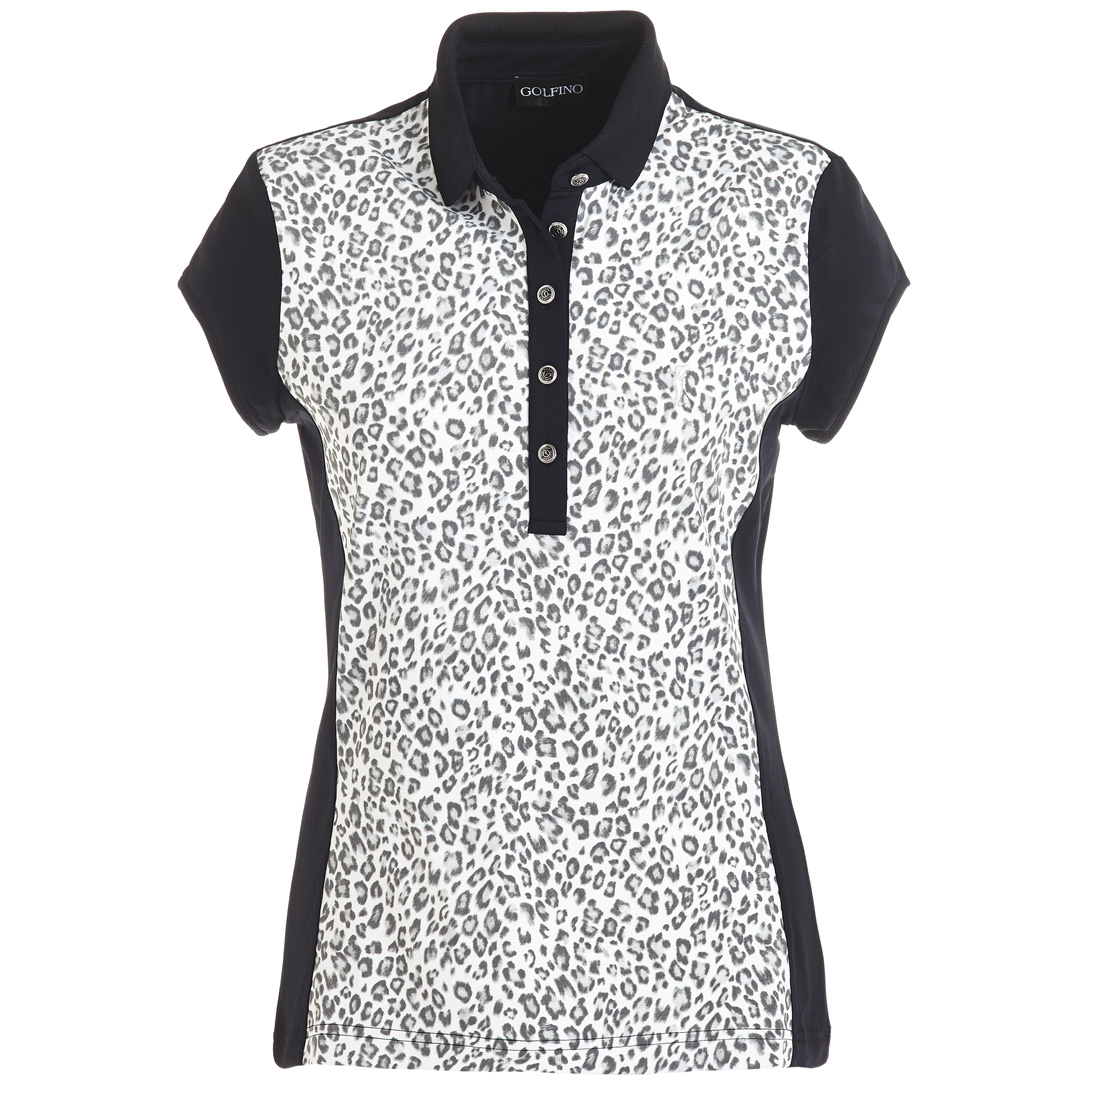 Ärmelloses Poloshirt mit Leoparden Print